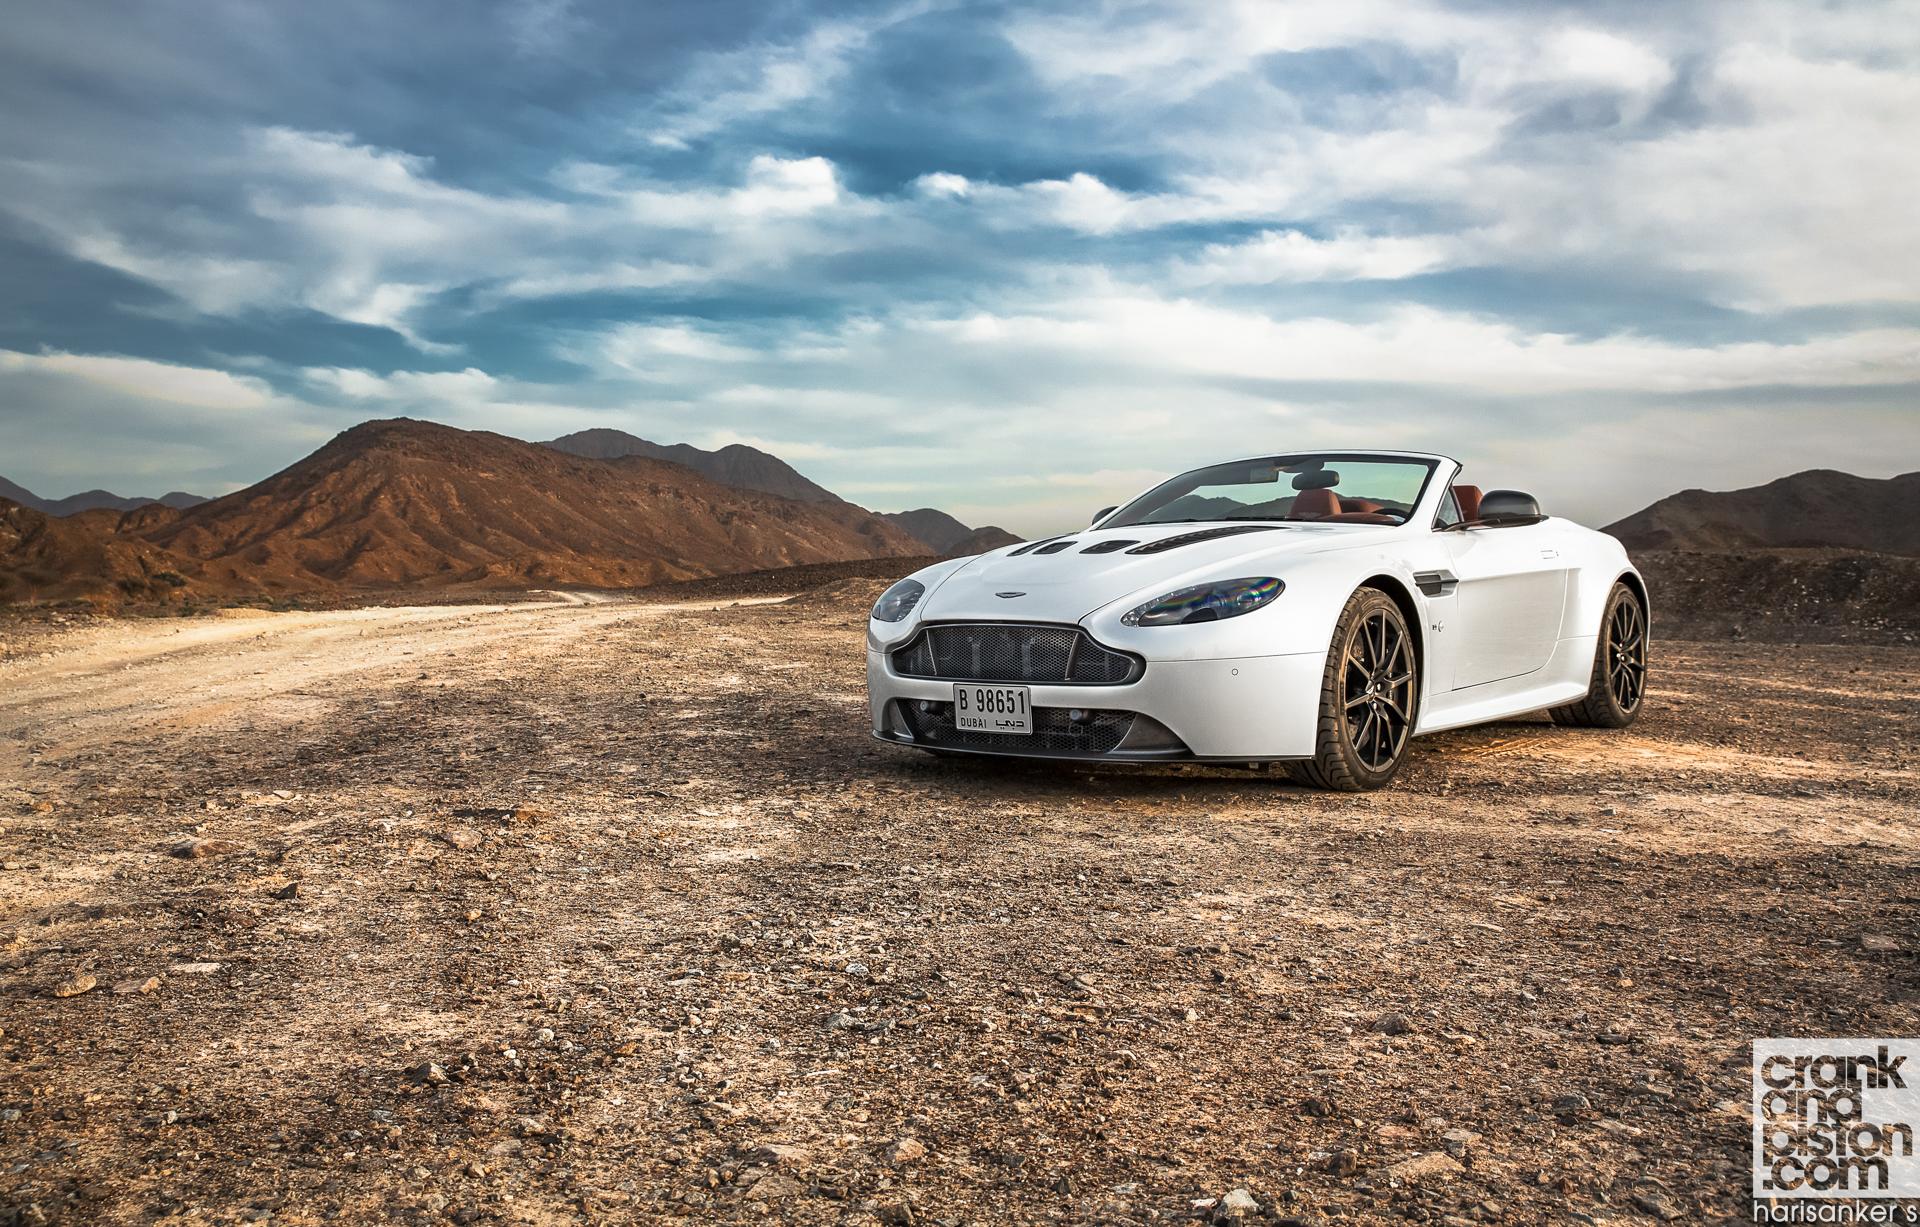 Aston Martin V12 Vantage S Roadster crankandpiston Wallpapers-7